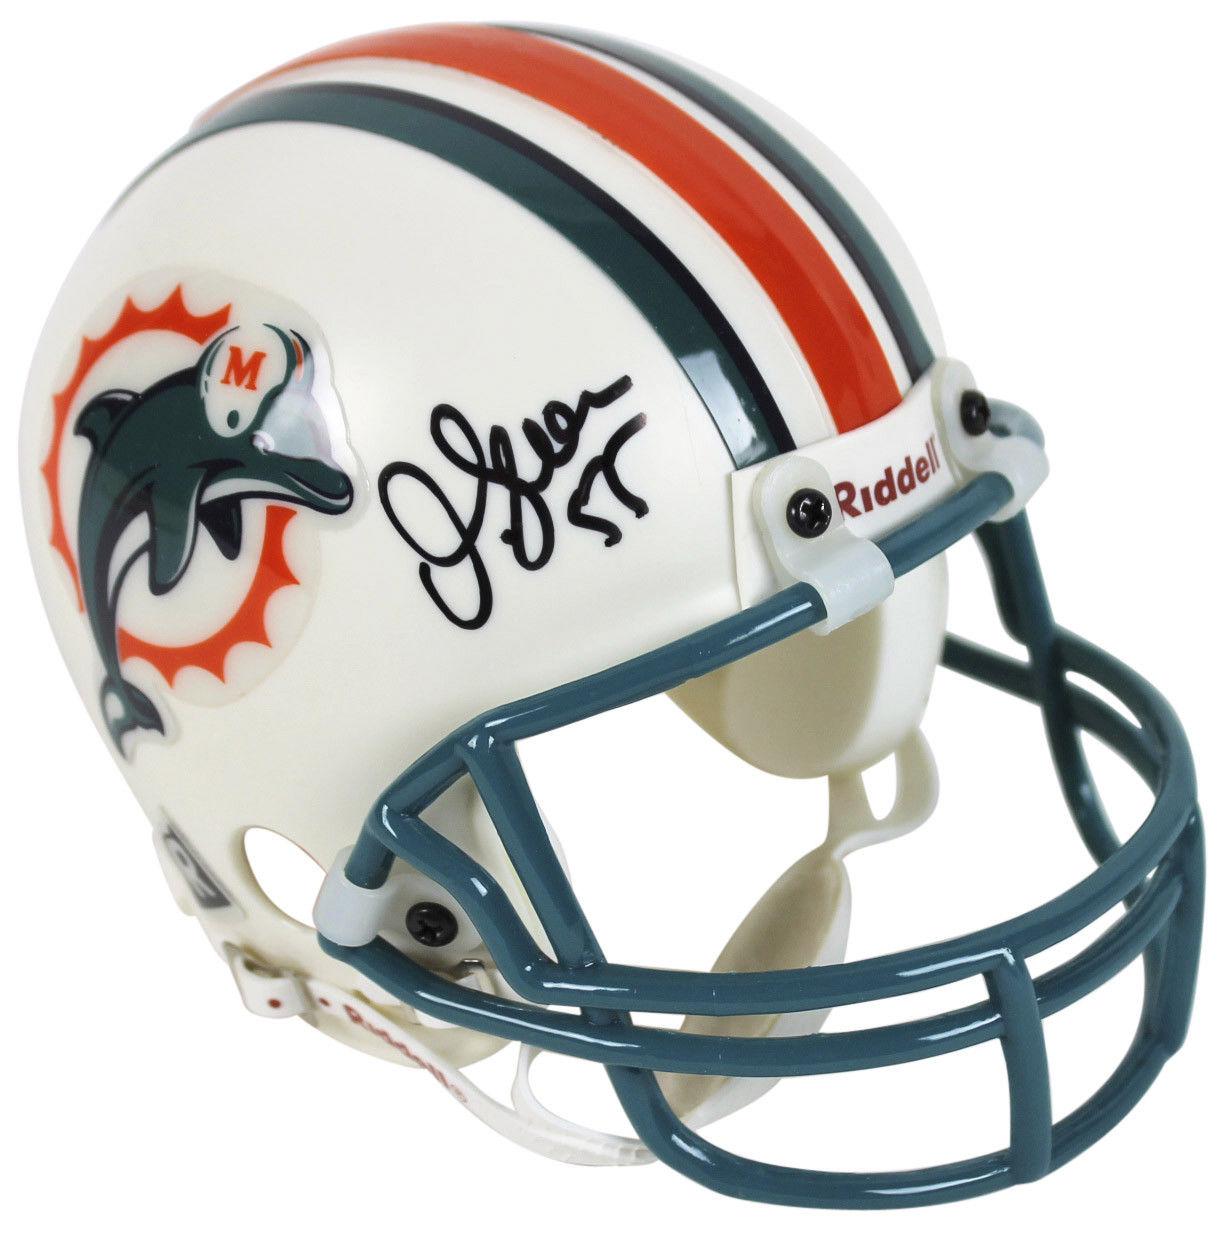 newest 353c6 80809 Lot Detail - Junior Seau Signed Miami Dolphins Mini Helmet (JSA)